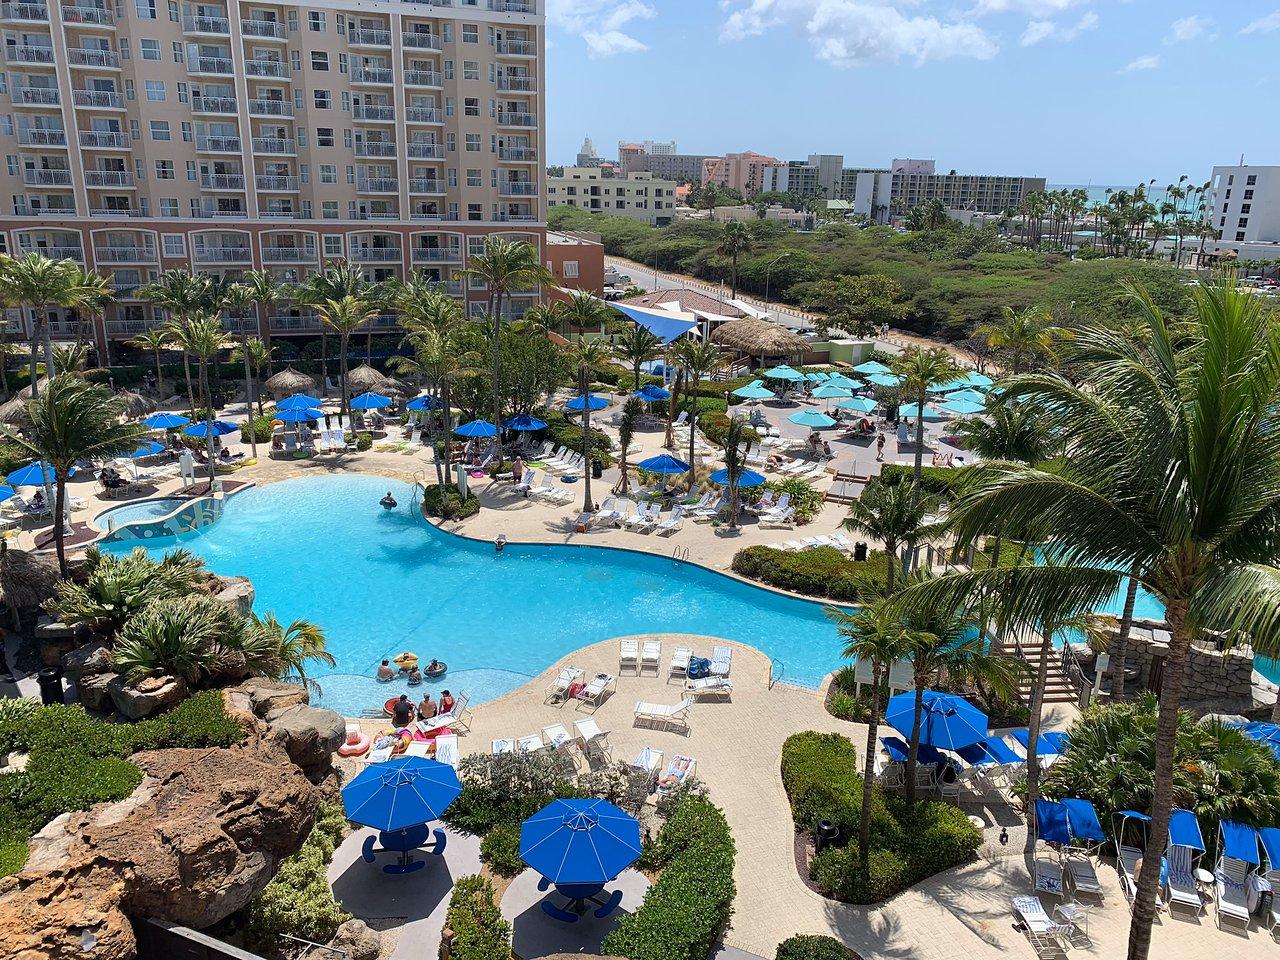 Marriott's Aruba Surf Club for Sale Timeshare